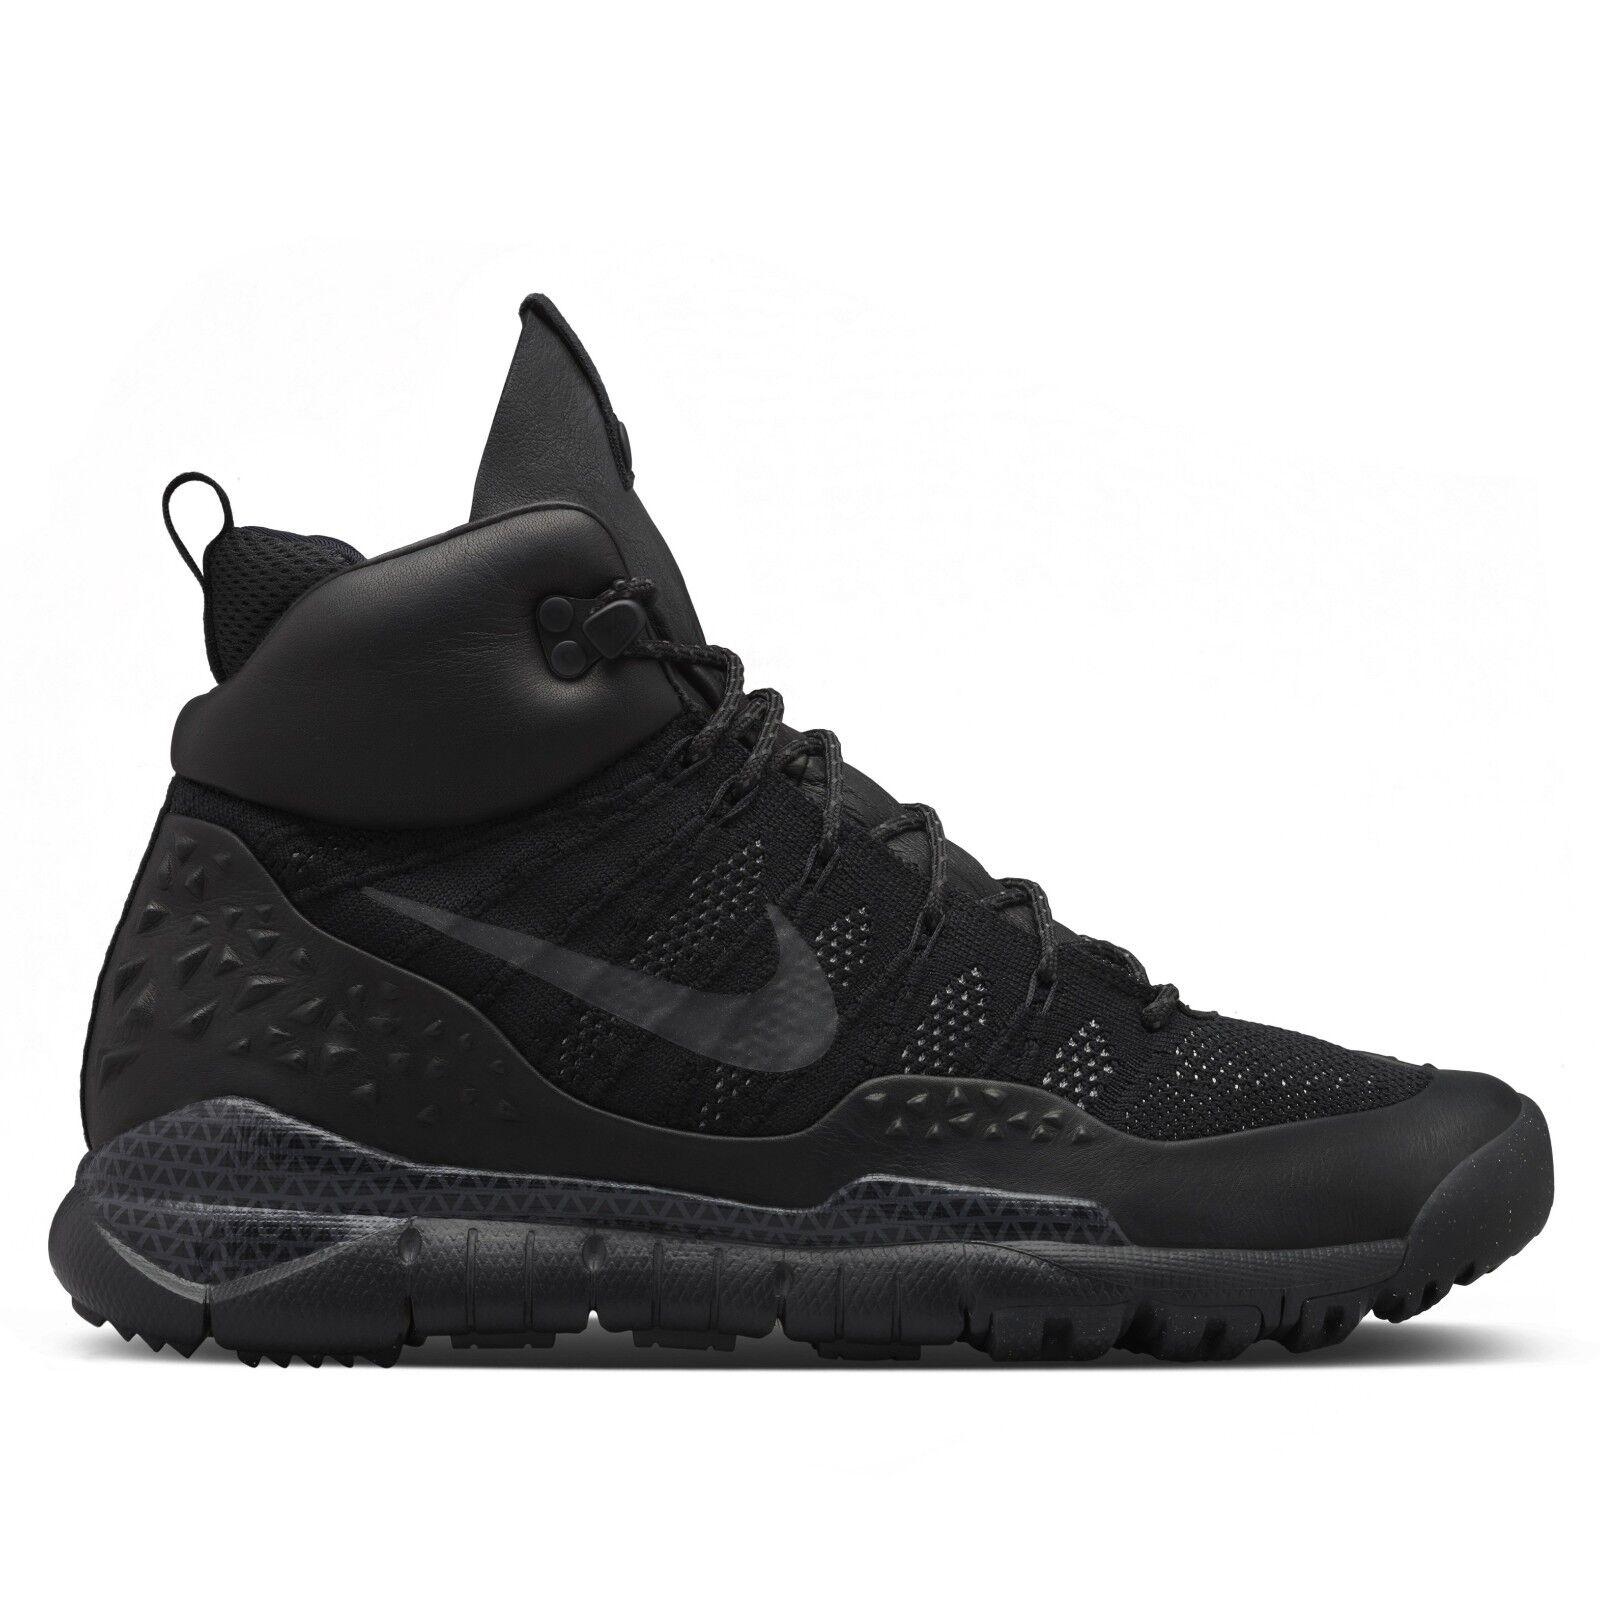 Nike acg nero lupinek flyknit antracite Uomo scarpe stivali 826077-001 nikelab